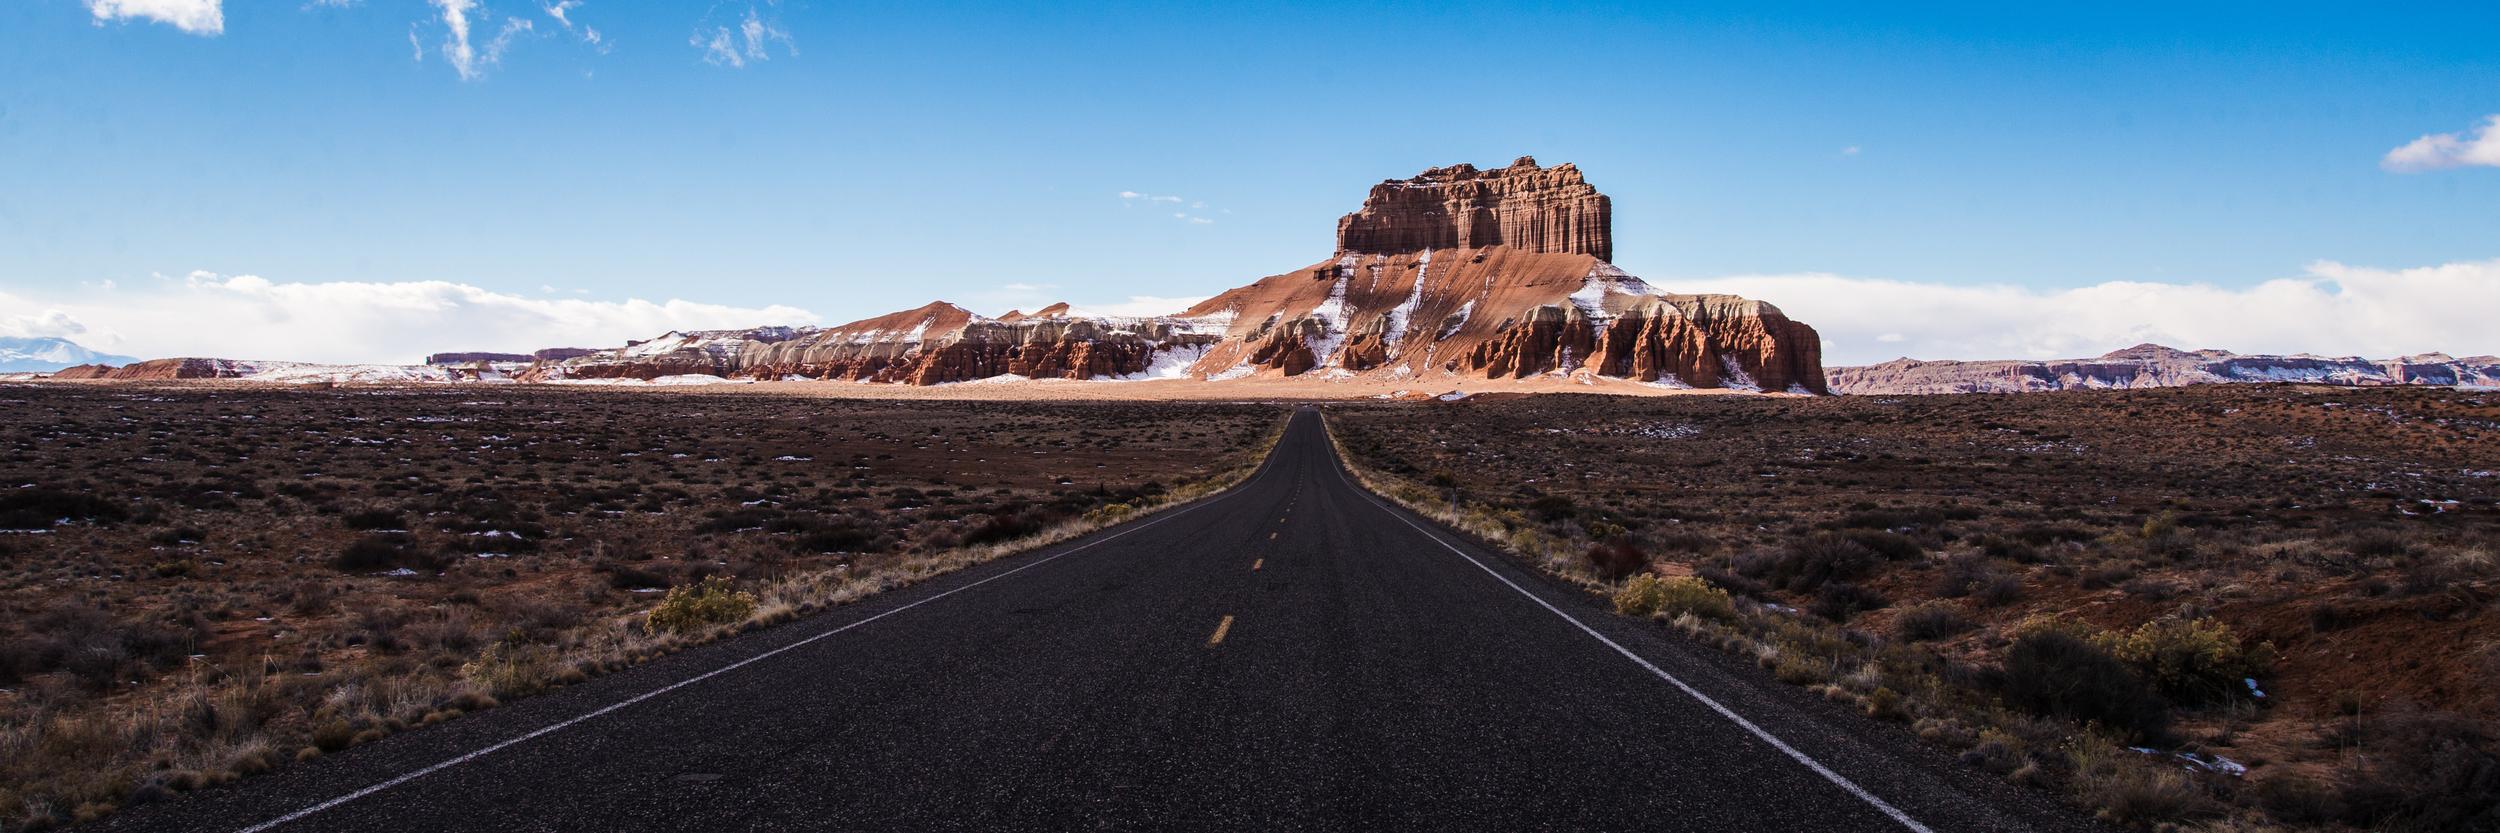 PLP_Roadtrip_US_2014-34.jpg